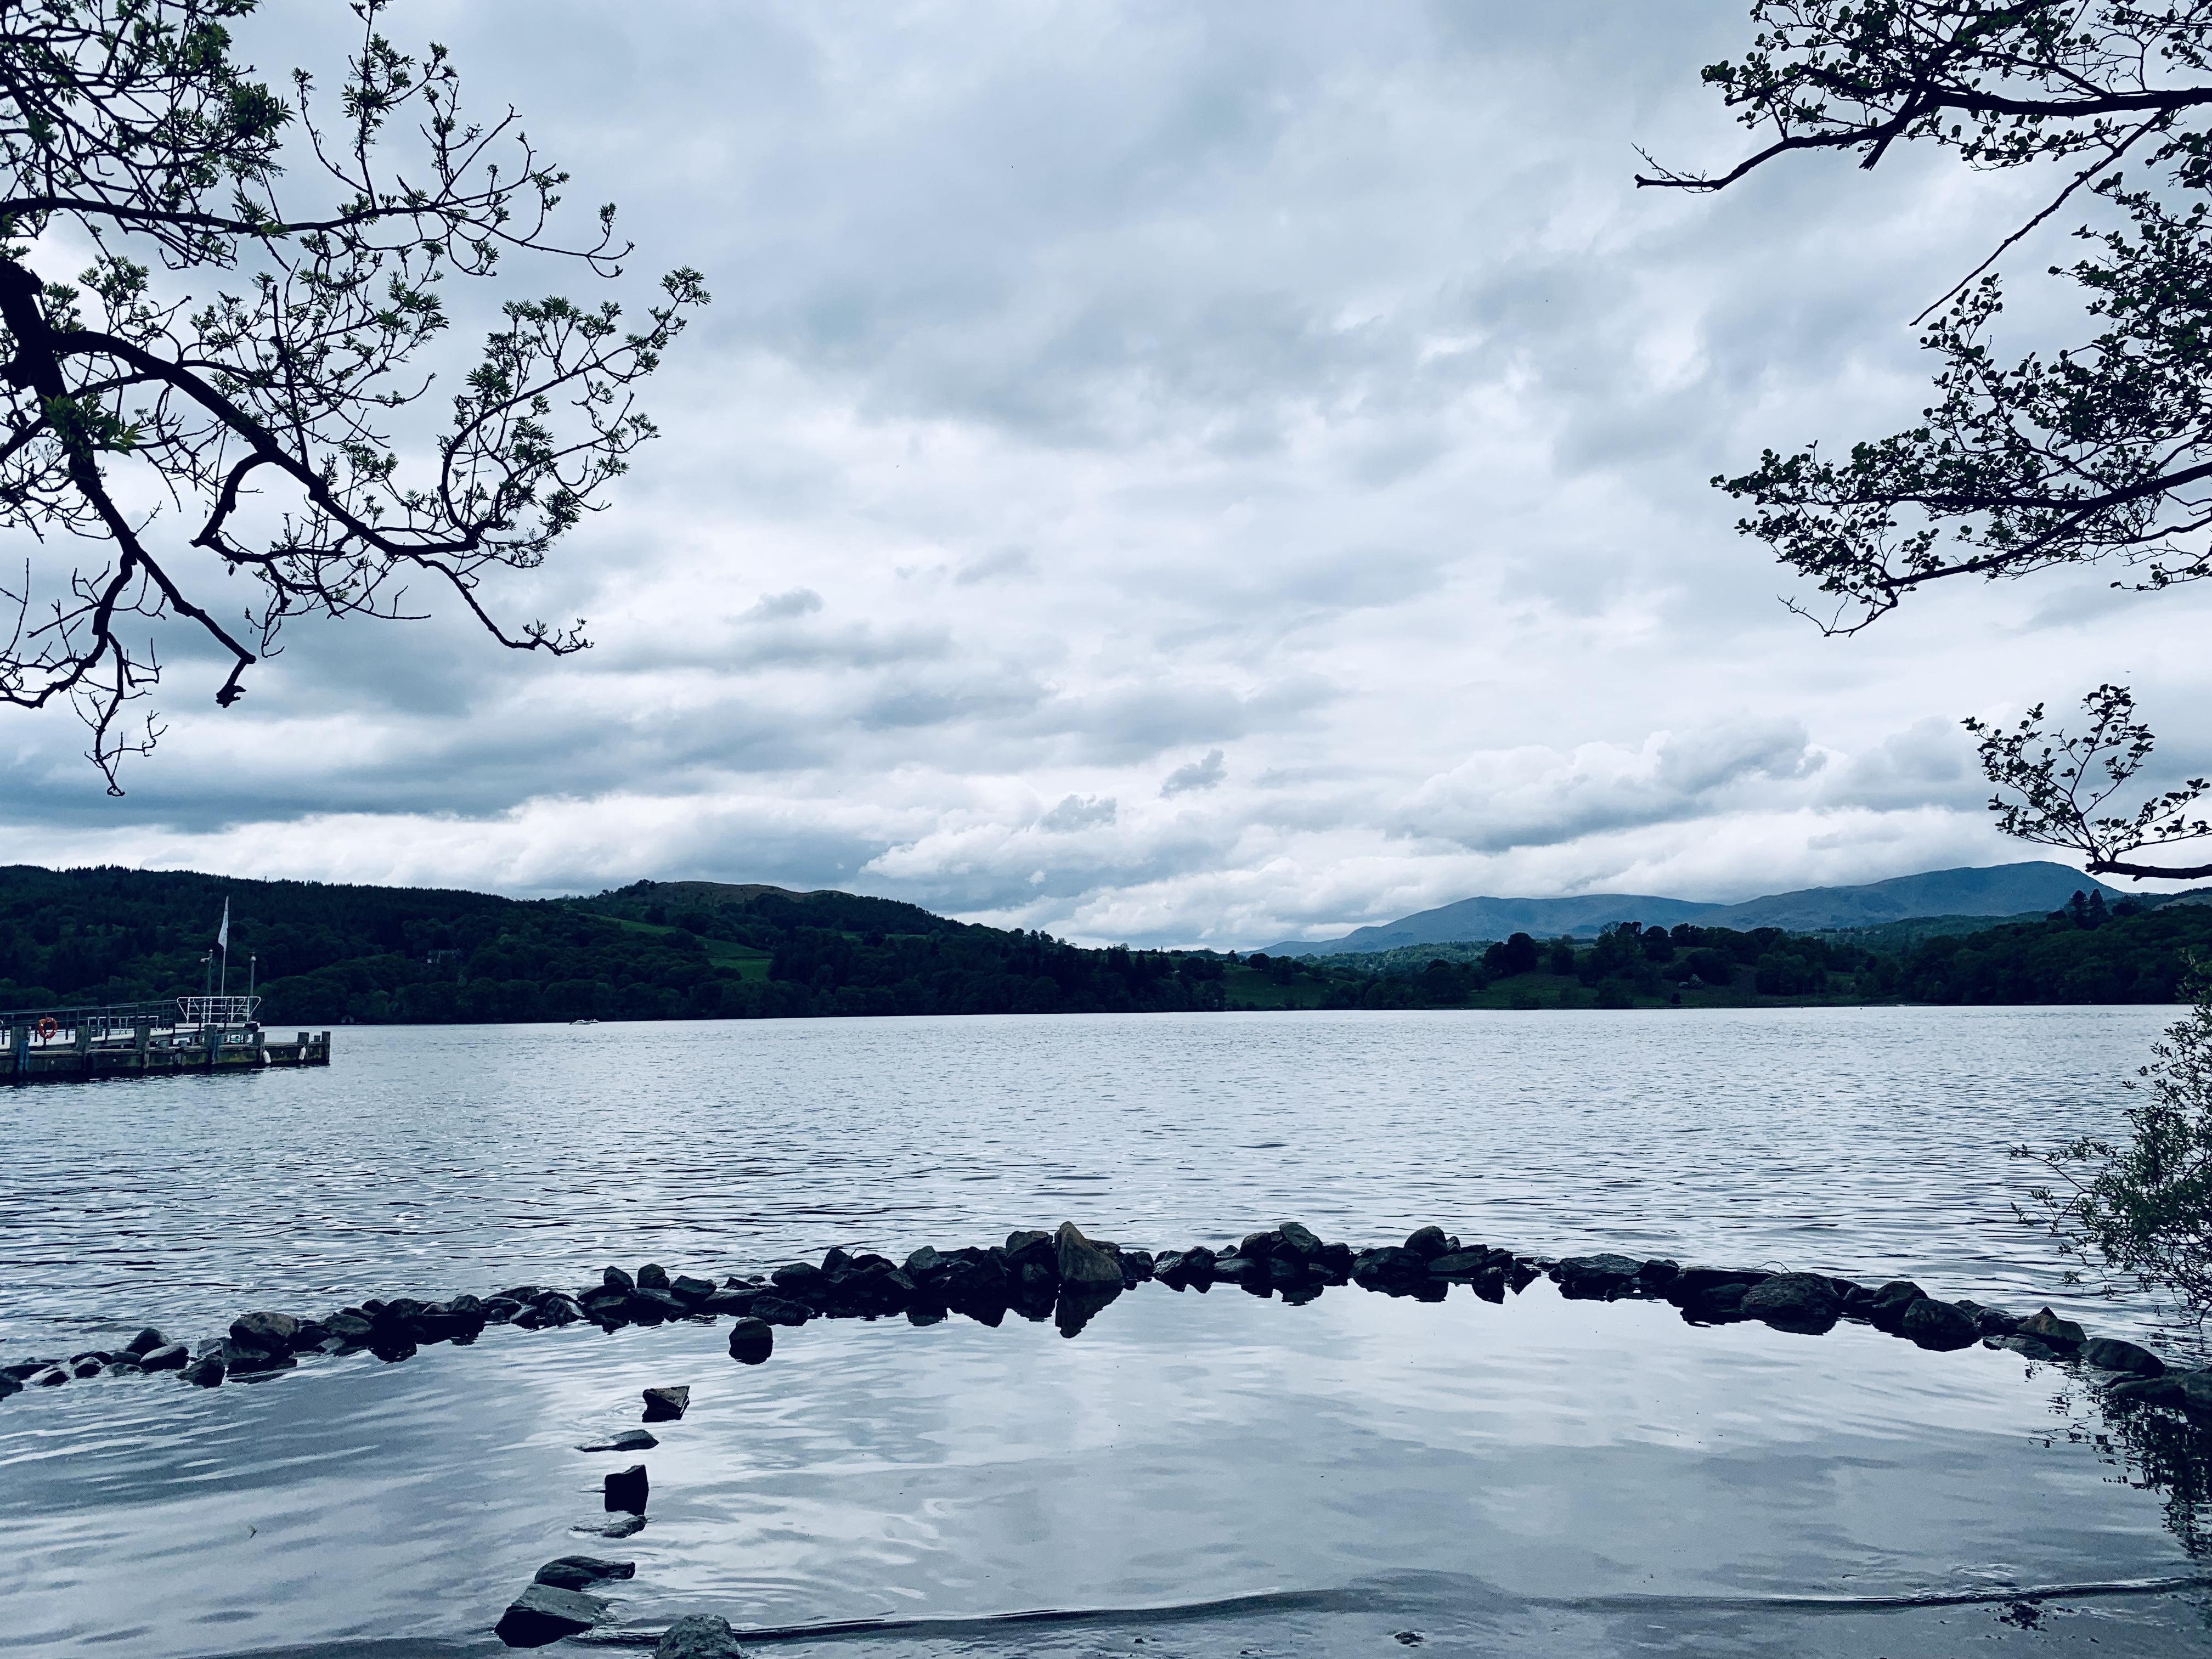 #MySundaySnapshot - Swan Lake 20/52 (2019)